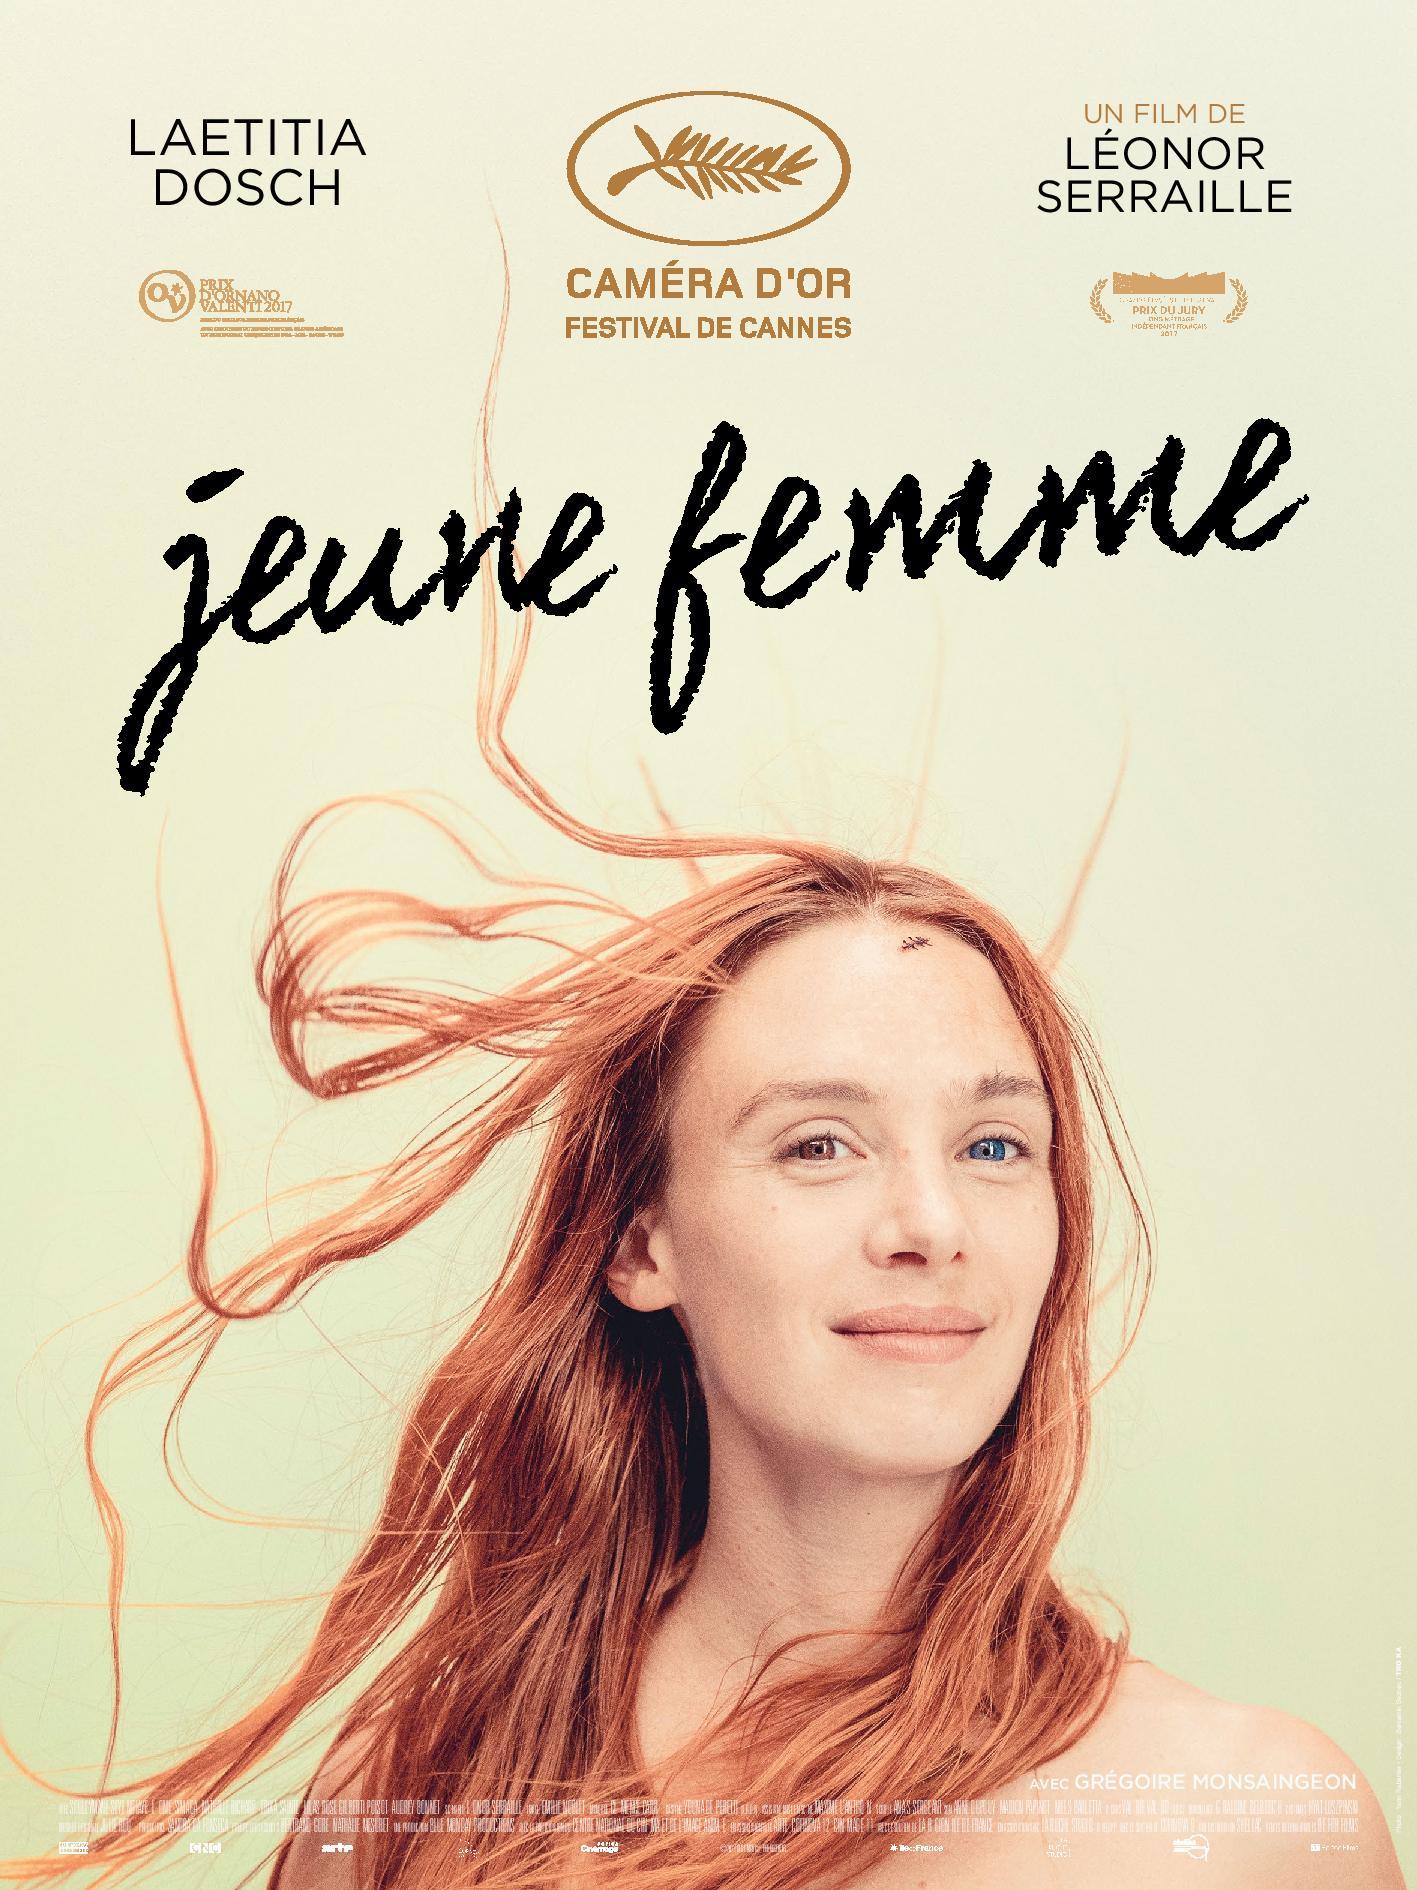 120x160 JEUNE FEMME 03-10 Vert Def-page-001.jpg